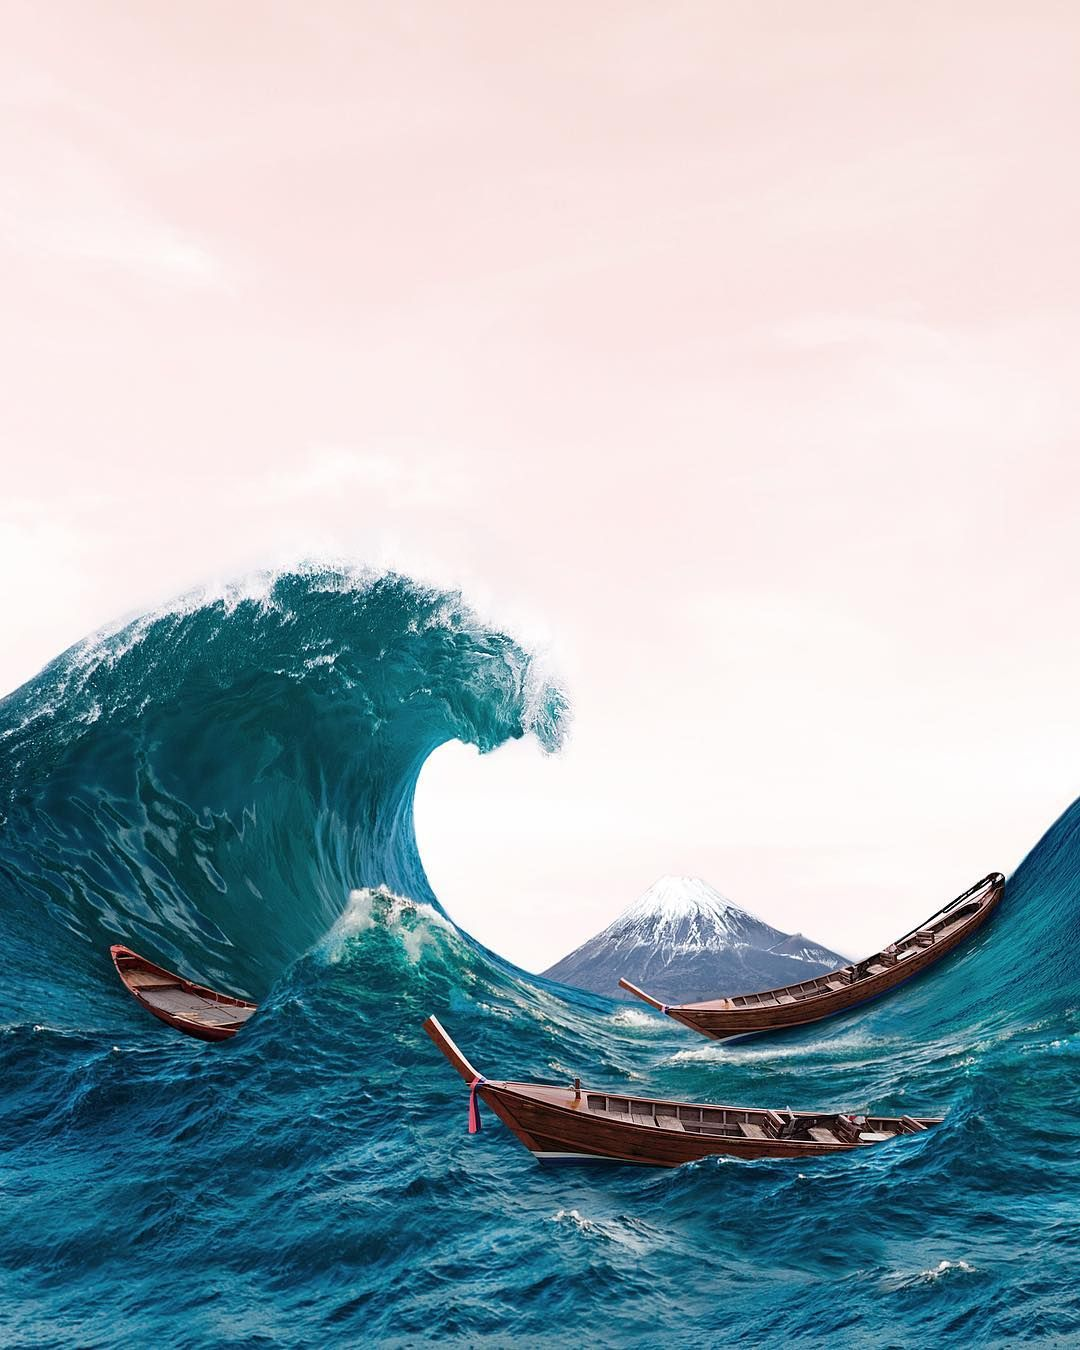 Japanese Wave Japan Japanese Waves Art Volcano Ocean Sea Wave Photoshop Landscape Photography Japanese Waves Photoshop Landscape Waves